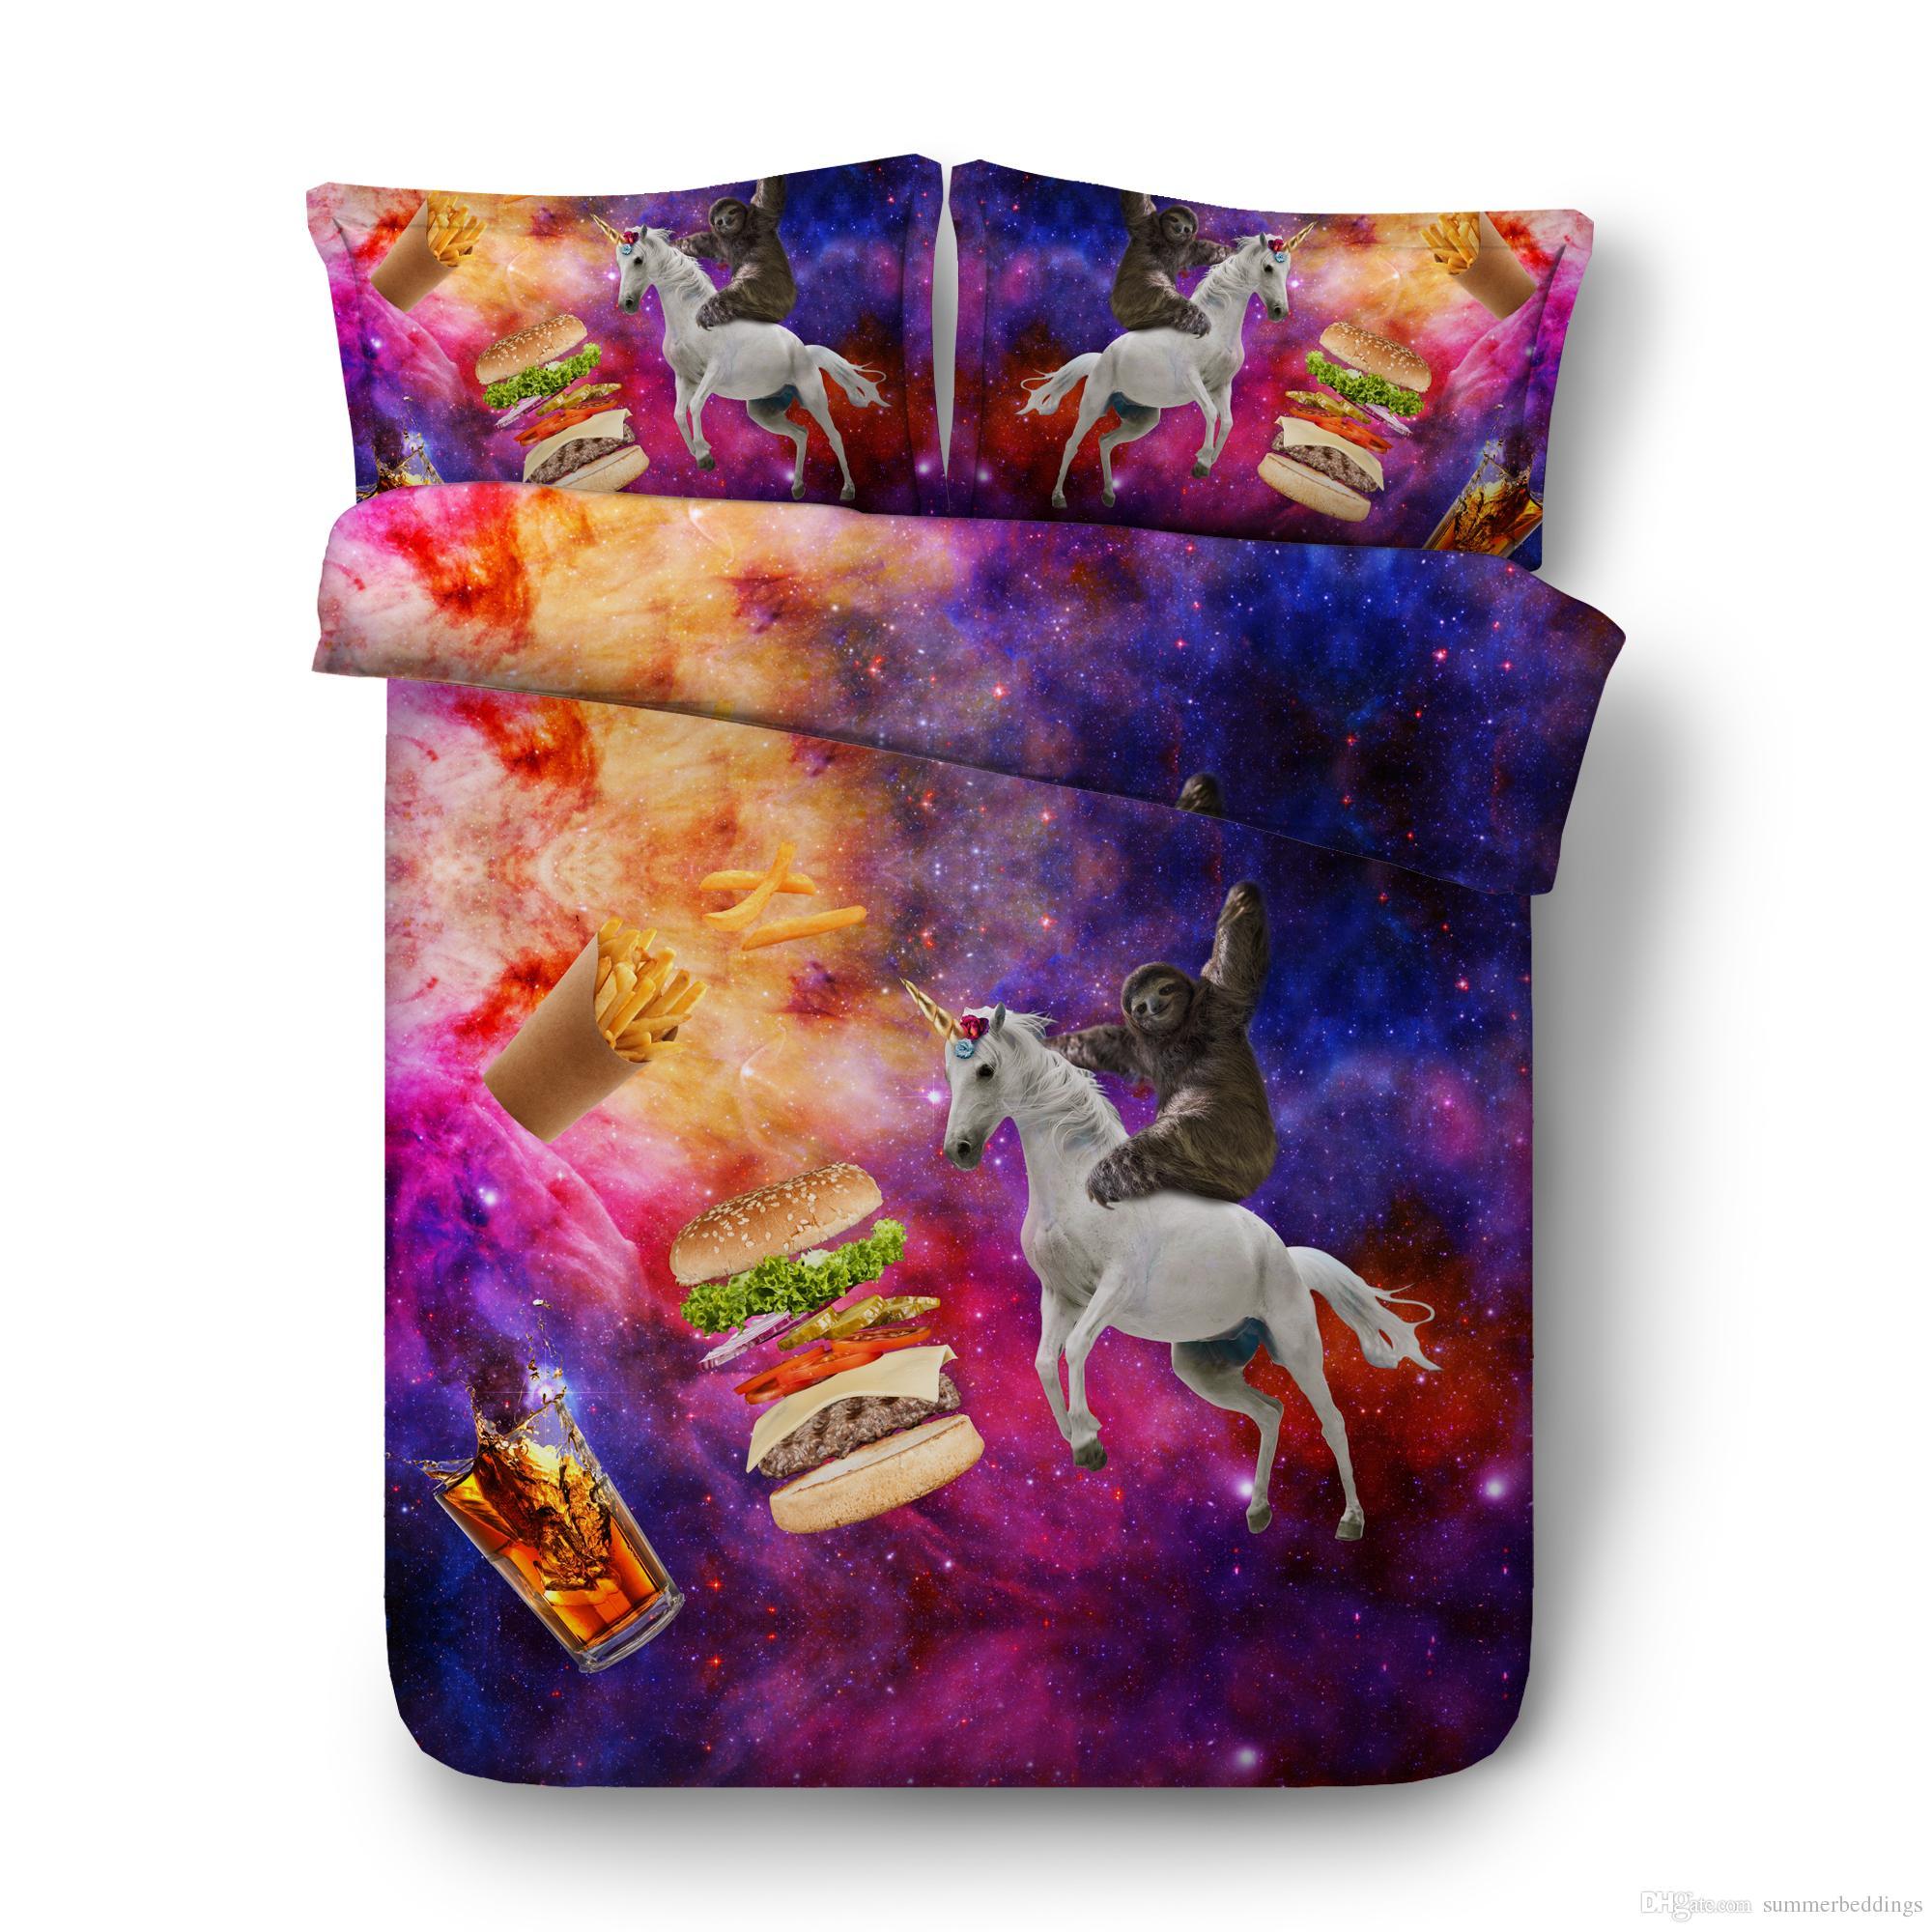 Bedding Sets Home Textile New Fashion Unicorn Bedding Set With Pillowcase Unicorn Print Duvet Cover For Kids 50% OFF